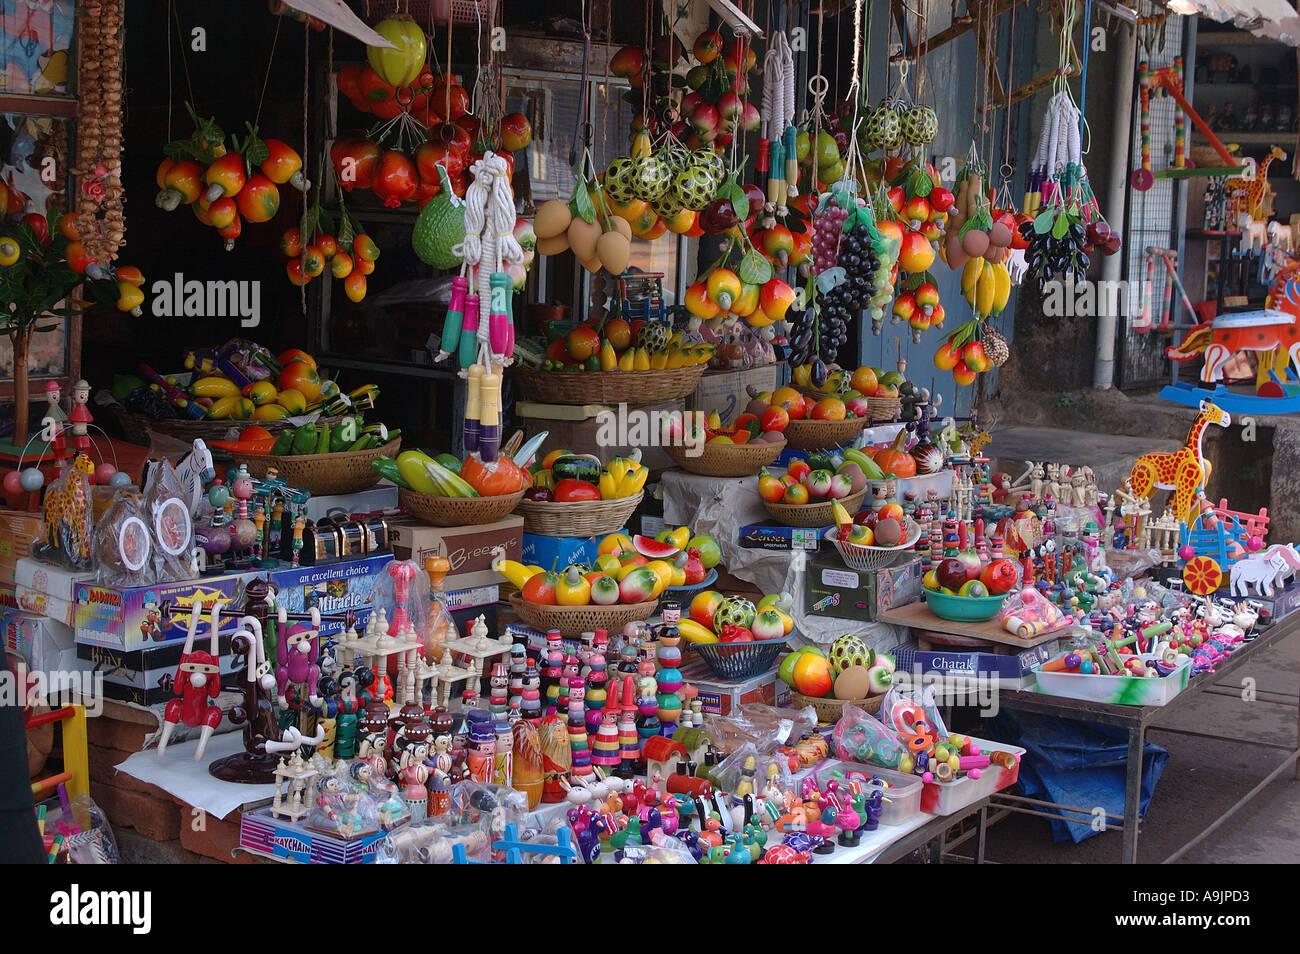 Wooden Toy Shop Sawantwadi Sindhudurga Maharashtra India Stock Photo